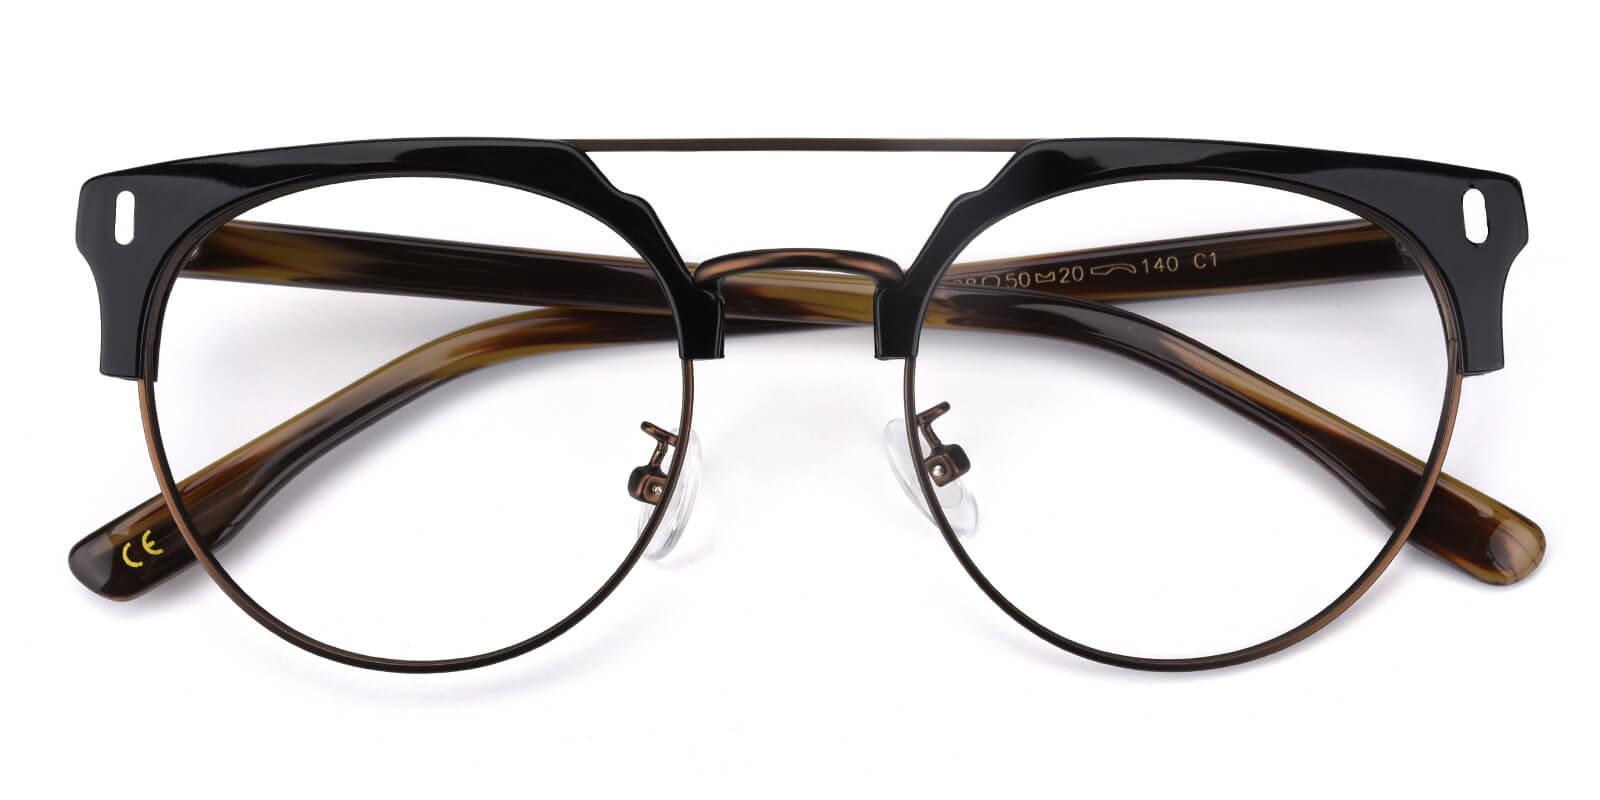 Timons-Brown-Aviator-Combination-Eyeglasses-detail